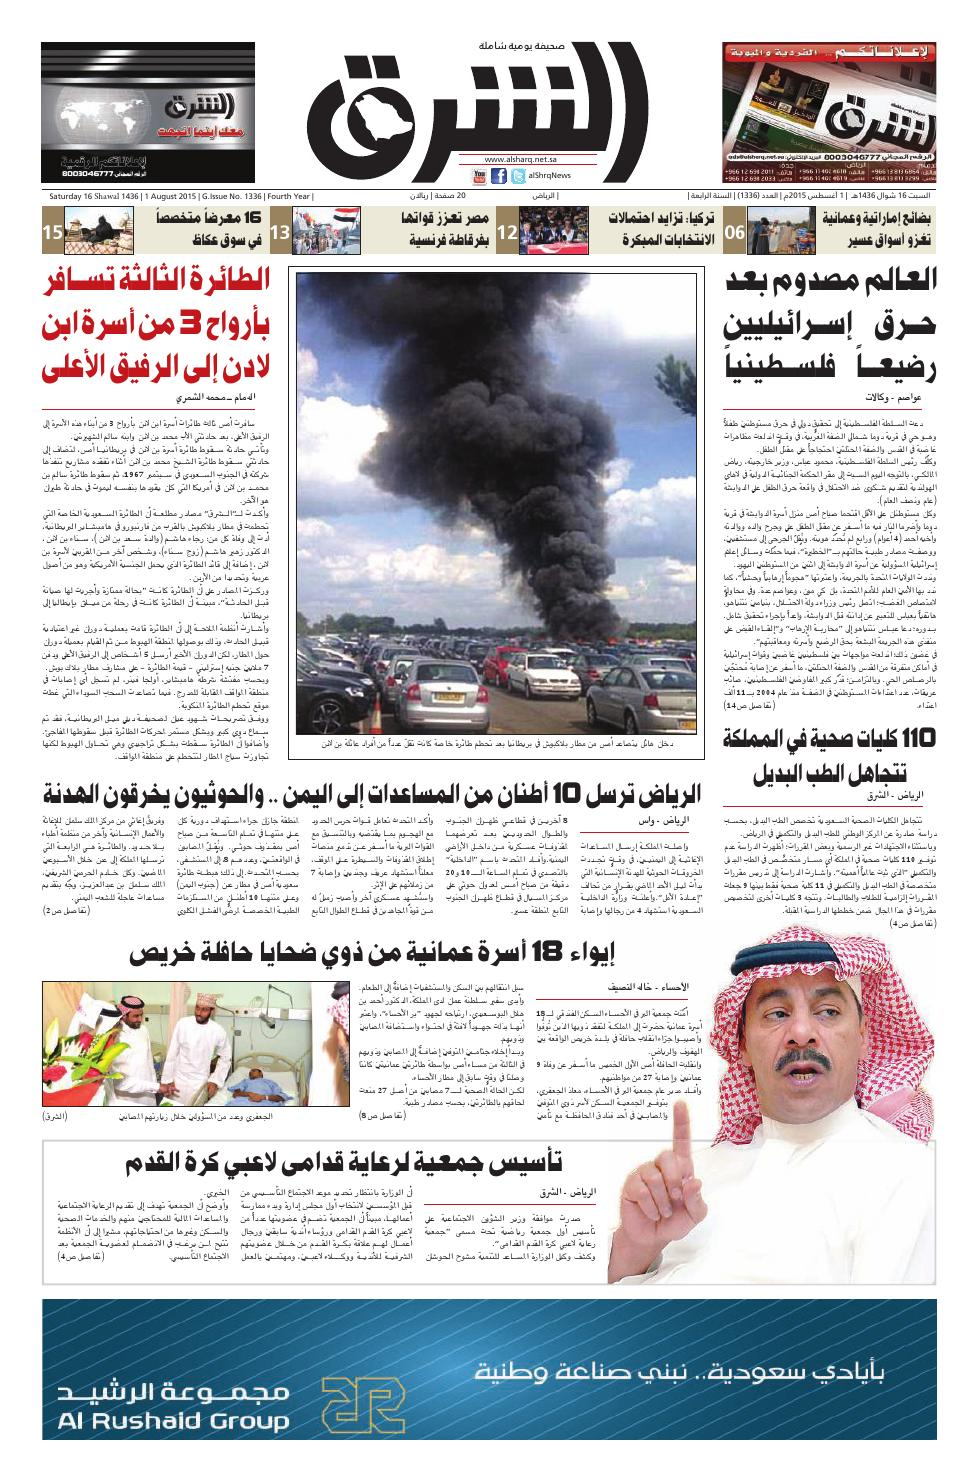 0653d83c9 صحيفة الشرق - العدد 1336 - نسخة الرياض by صحيفة الشرق السعودية - issuu